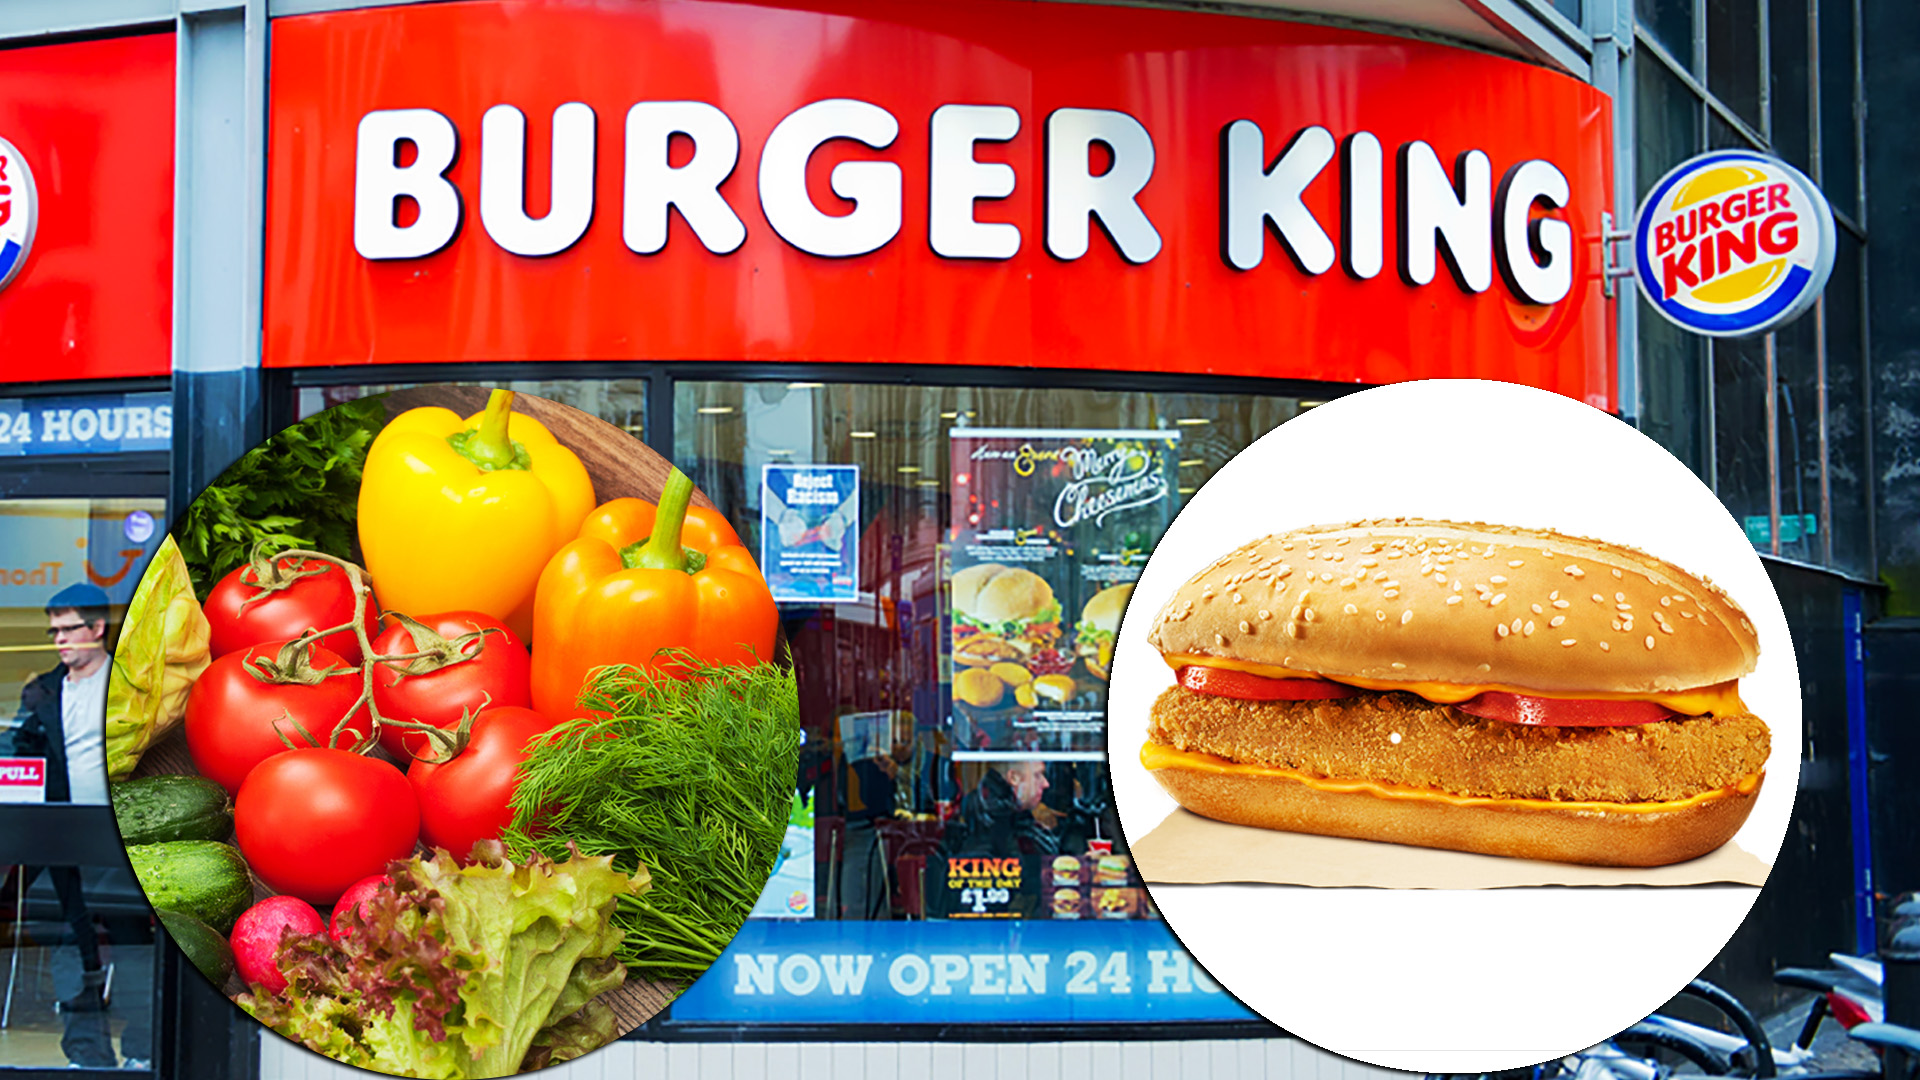 Veggie Burger Sales in India Have Burger King Eyeing a Global Market